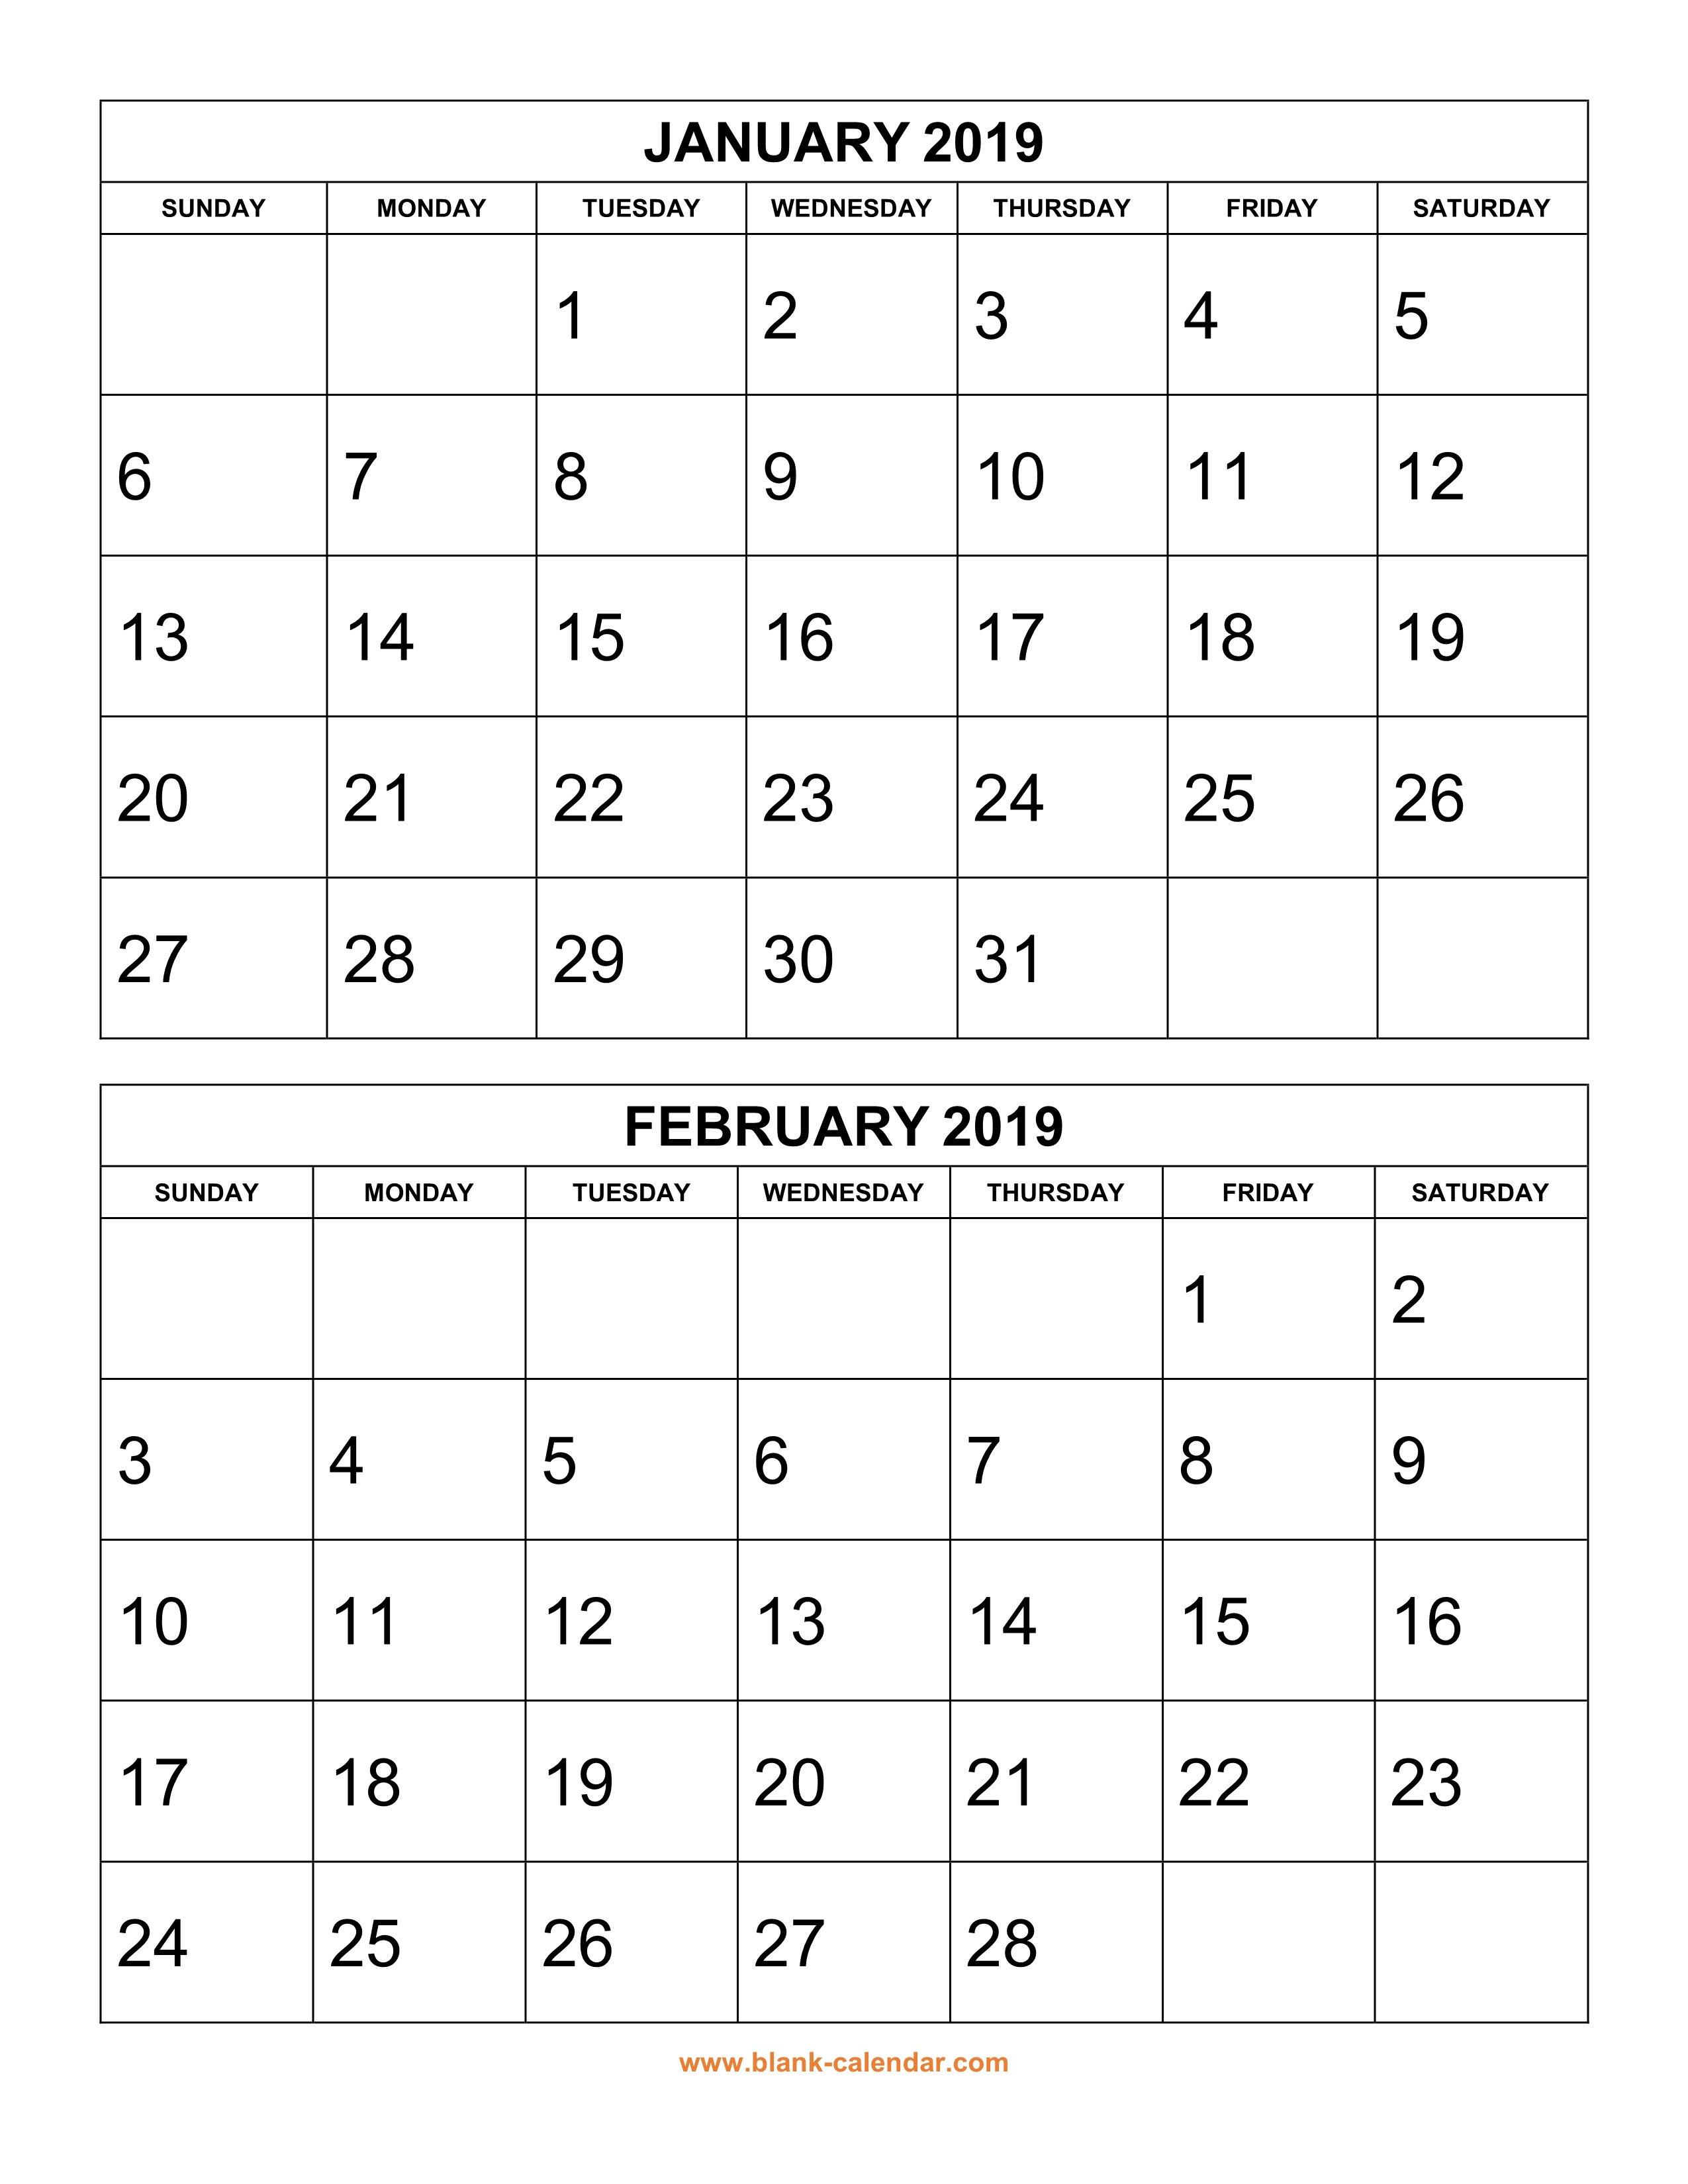 Free Download Printable Calendar 2019, 2 Months Per Page, 6 Pages Printable Calendar 2019 6 Months